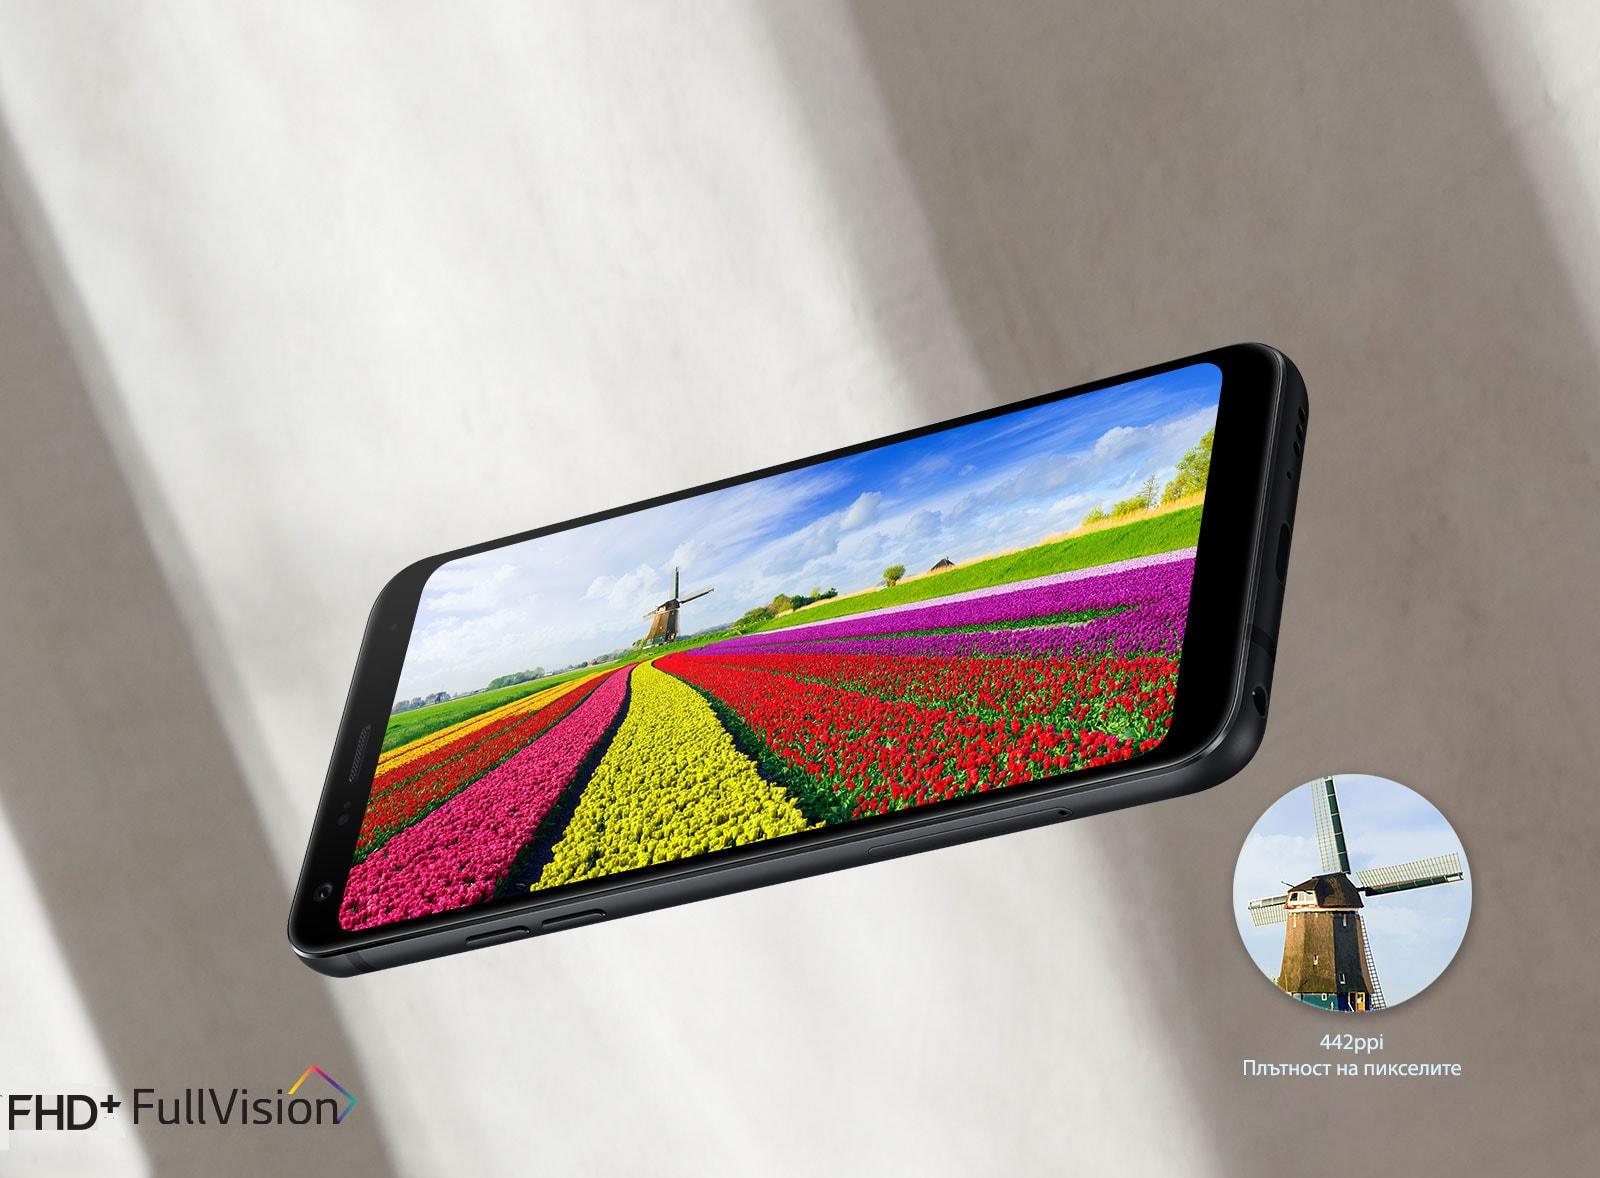 LG_Q7_Dual_SIM_fullvision_display_19102018_d_v1800_des